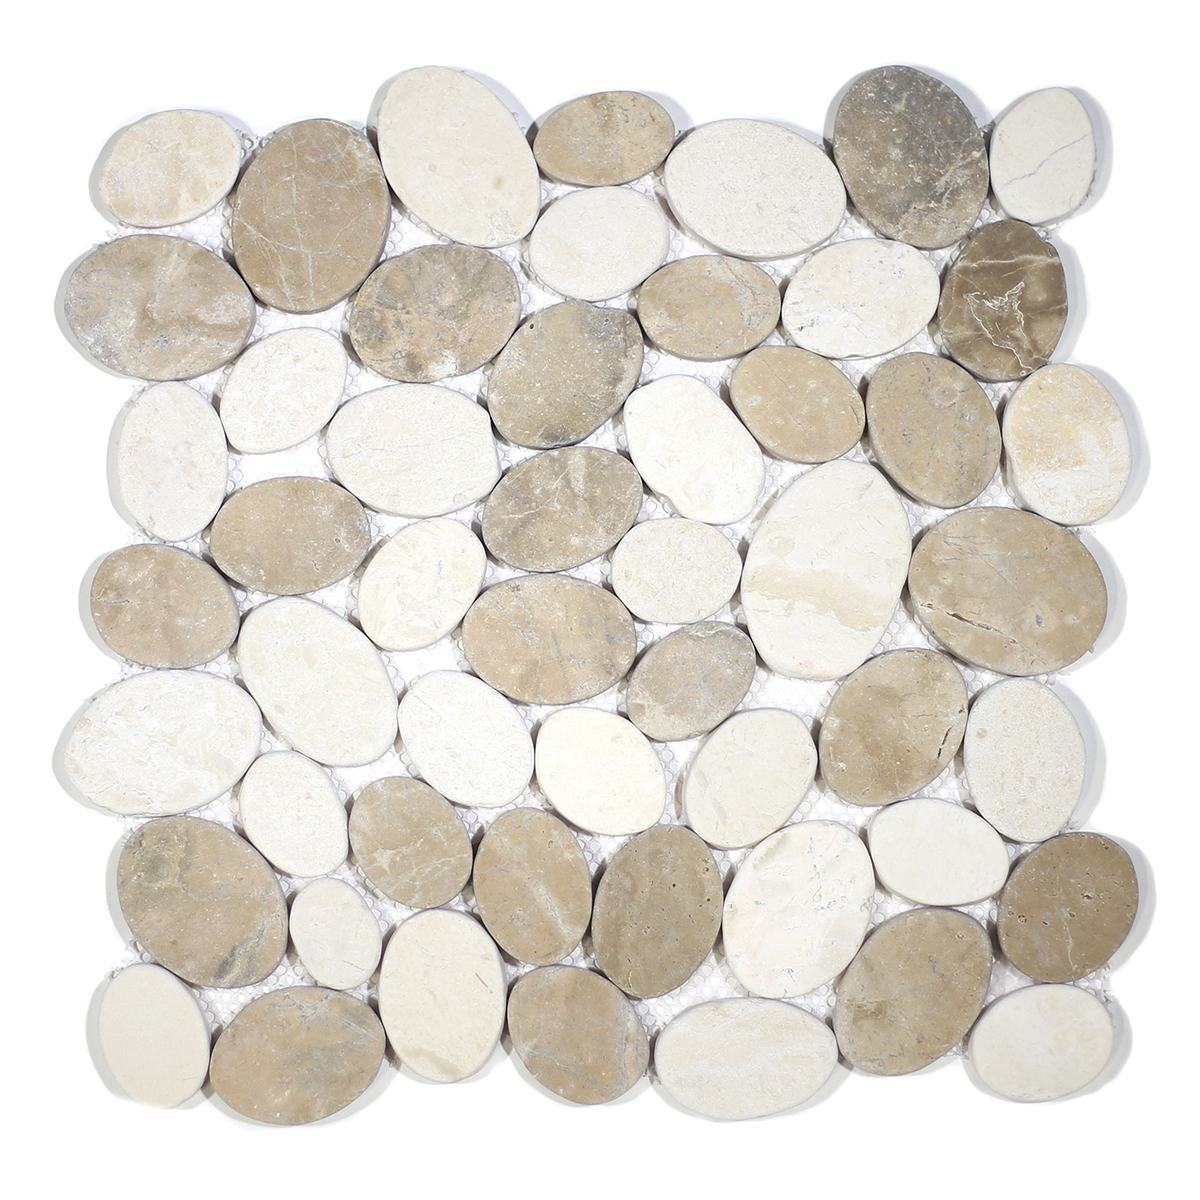 COIN MARBLE TAN & OFF-WHITE TUMBLED STONE PEBBLES